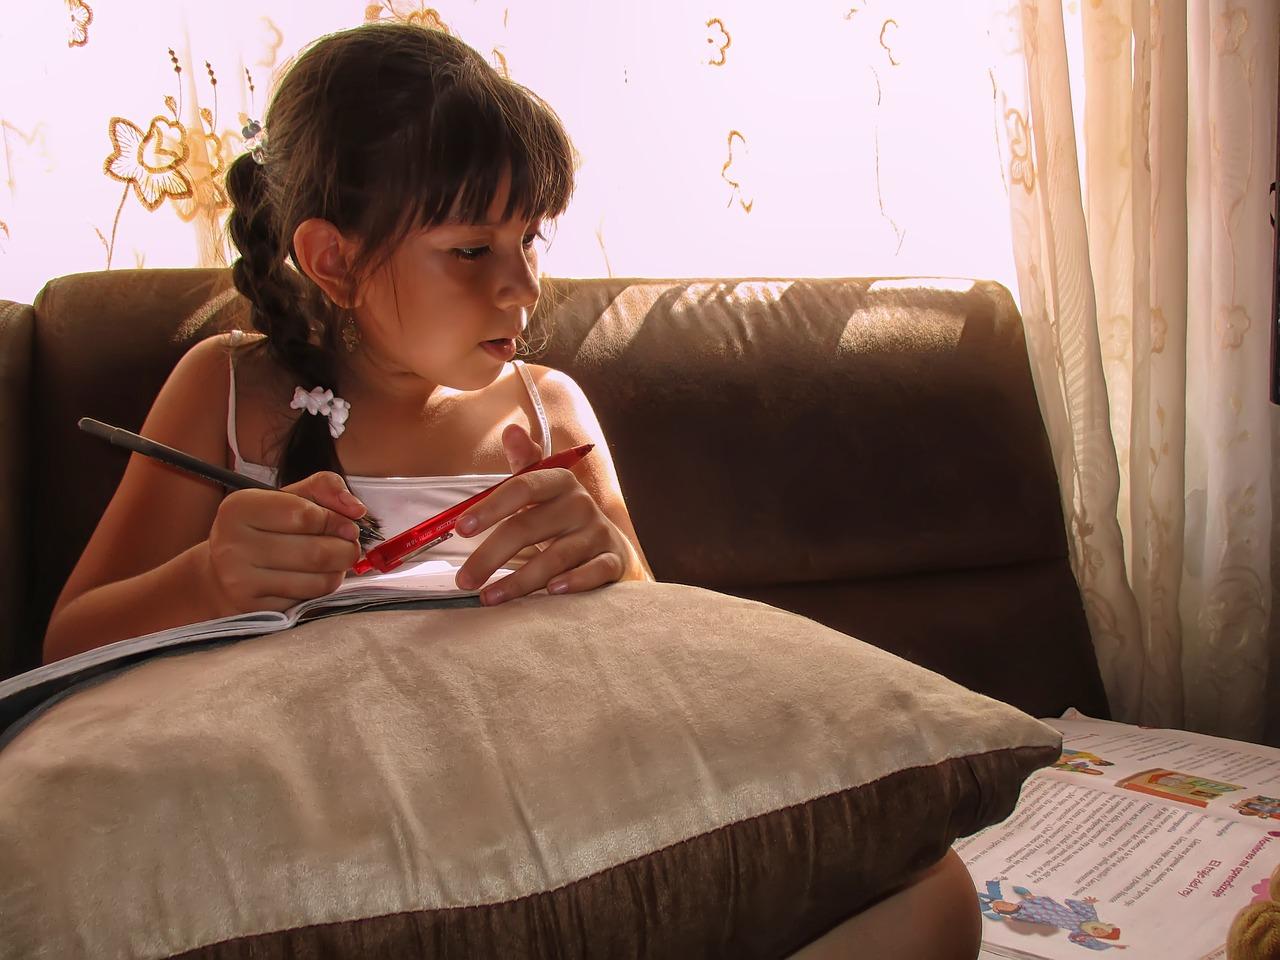 Developing literacy skills